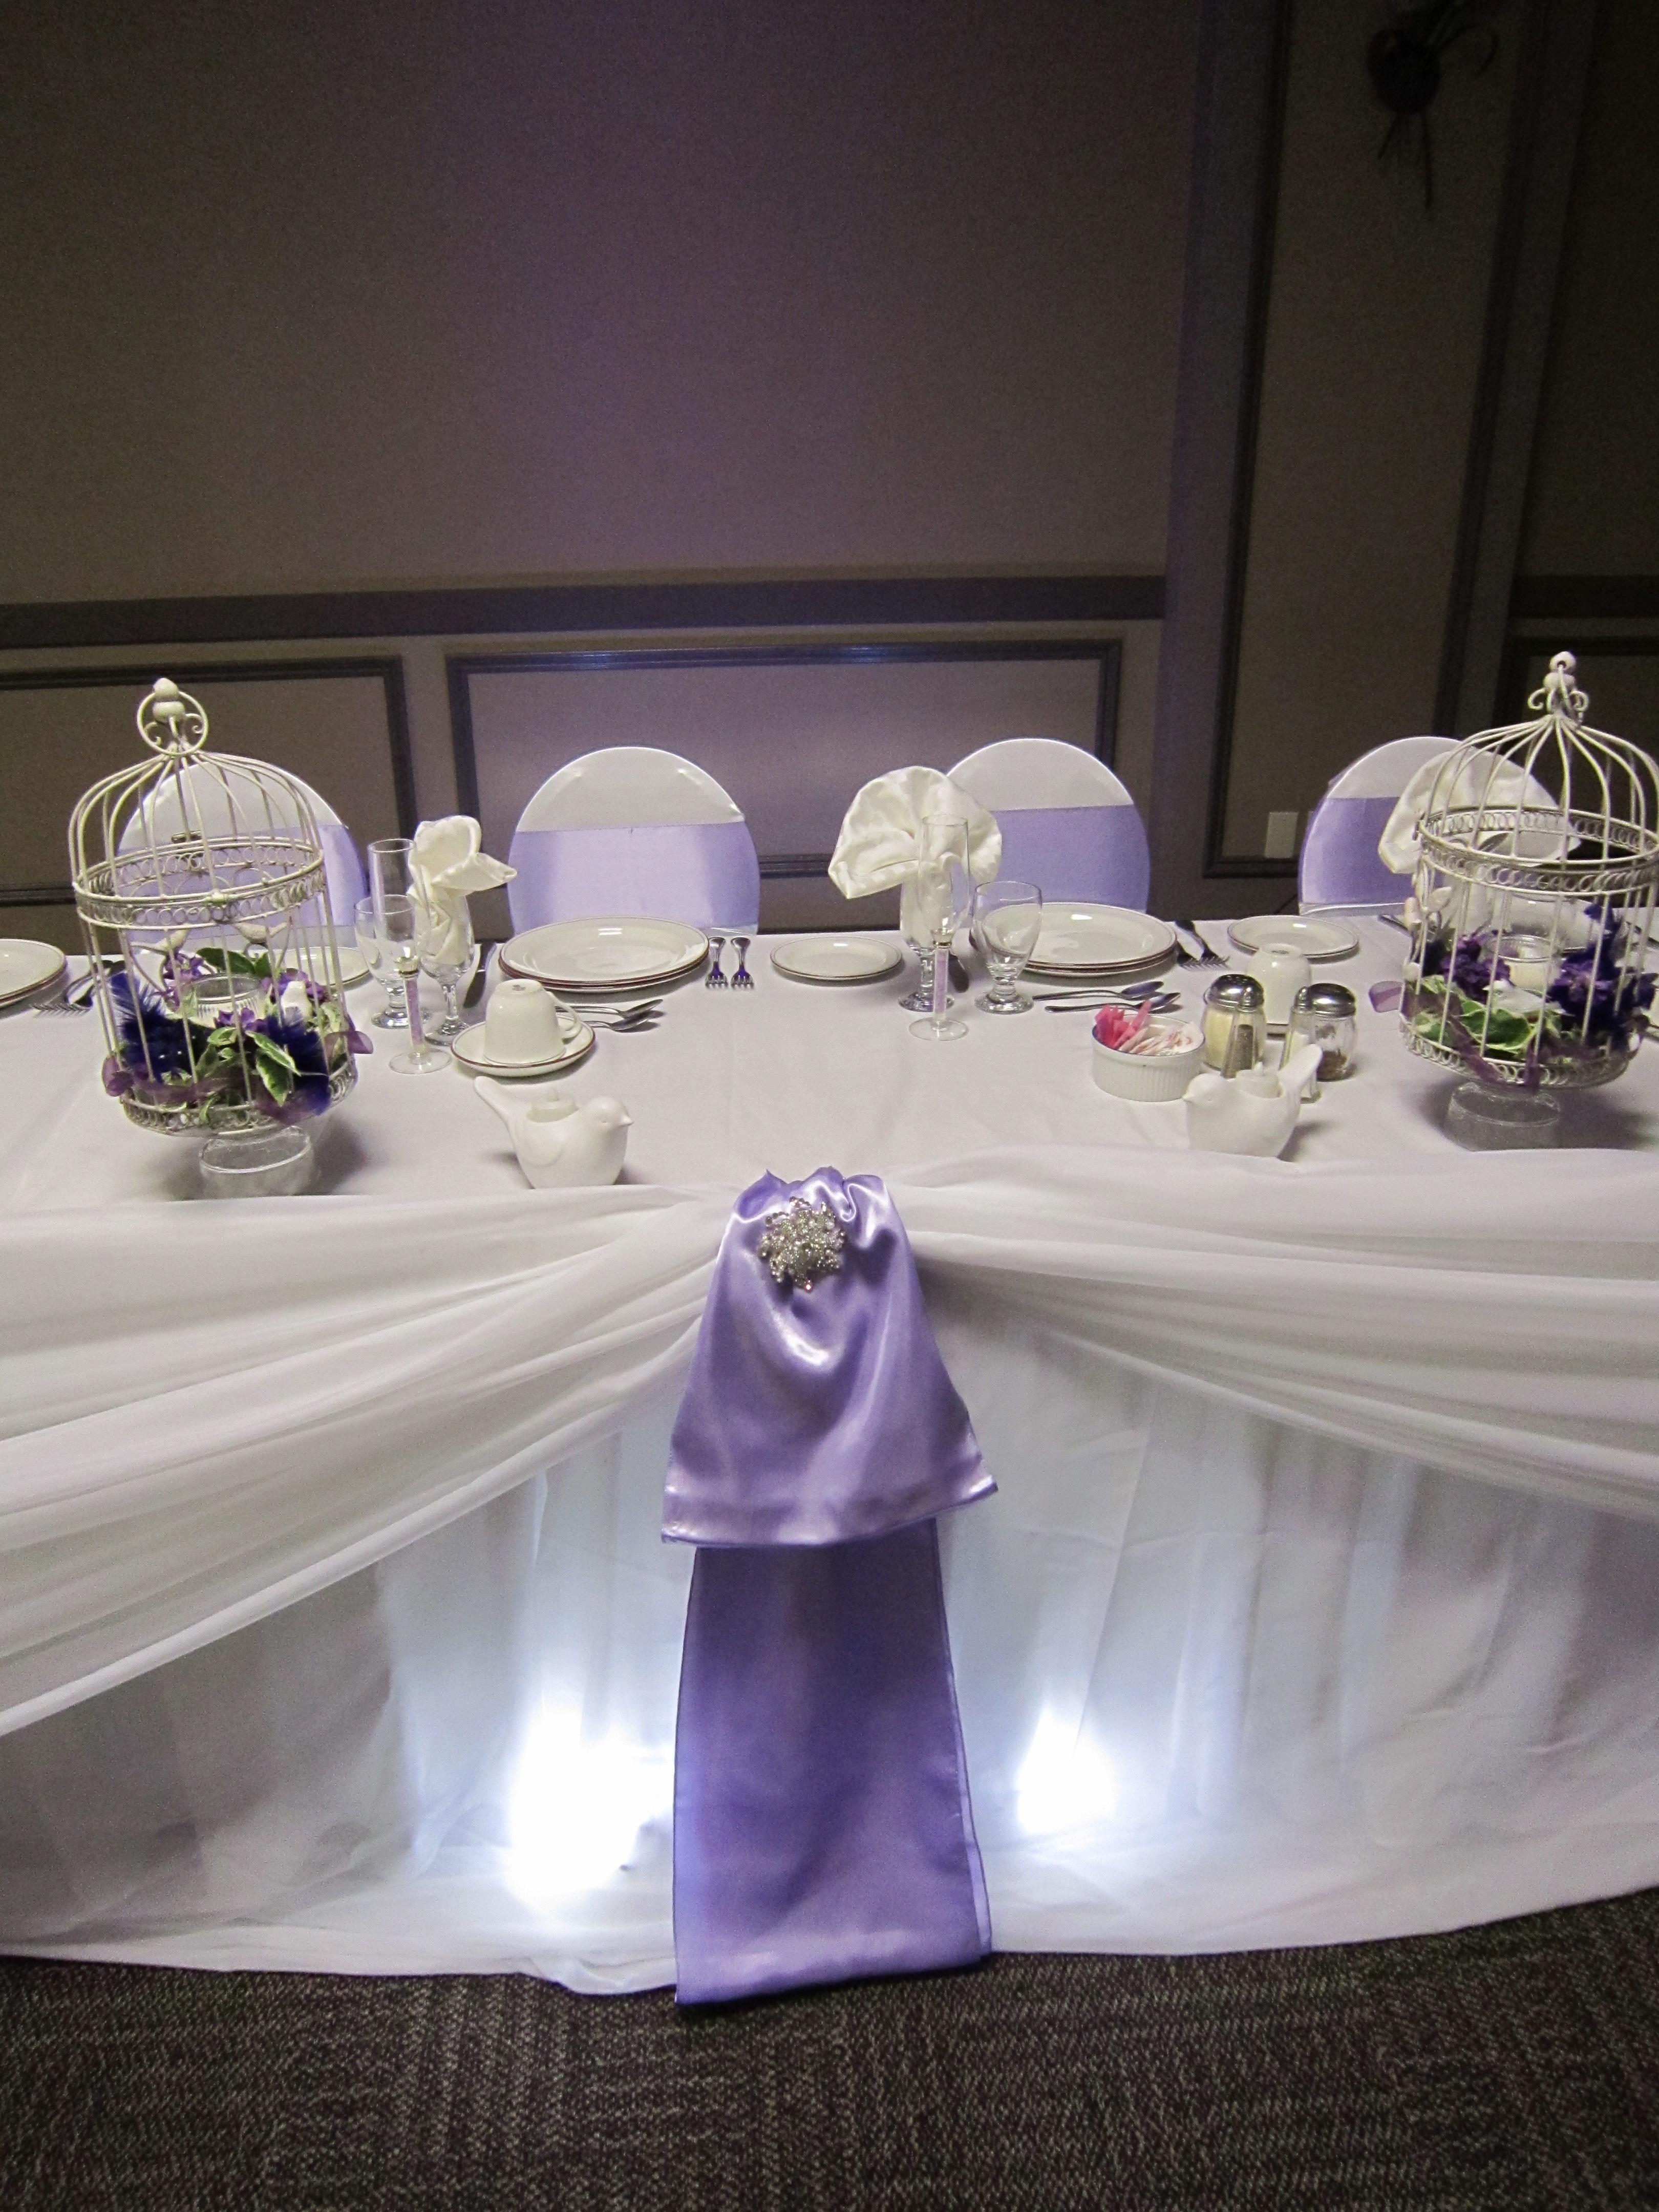 Head Table With Spot Lights Set The Mood Decor